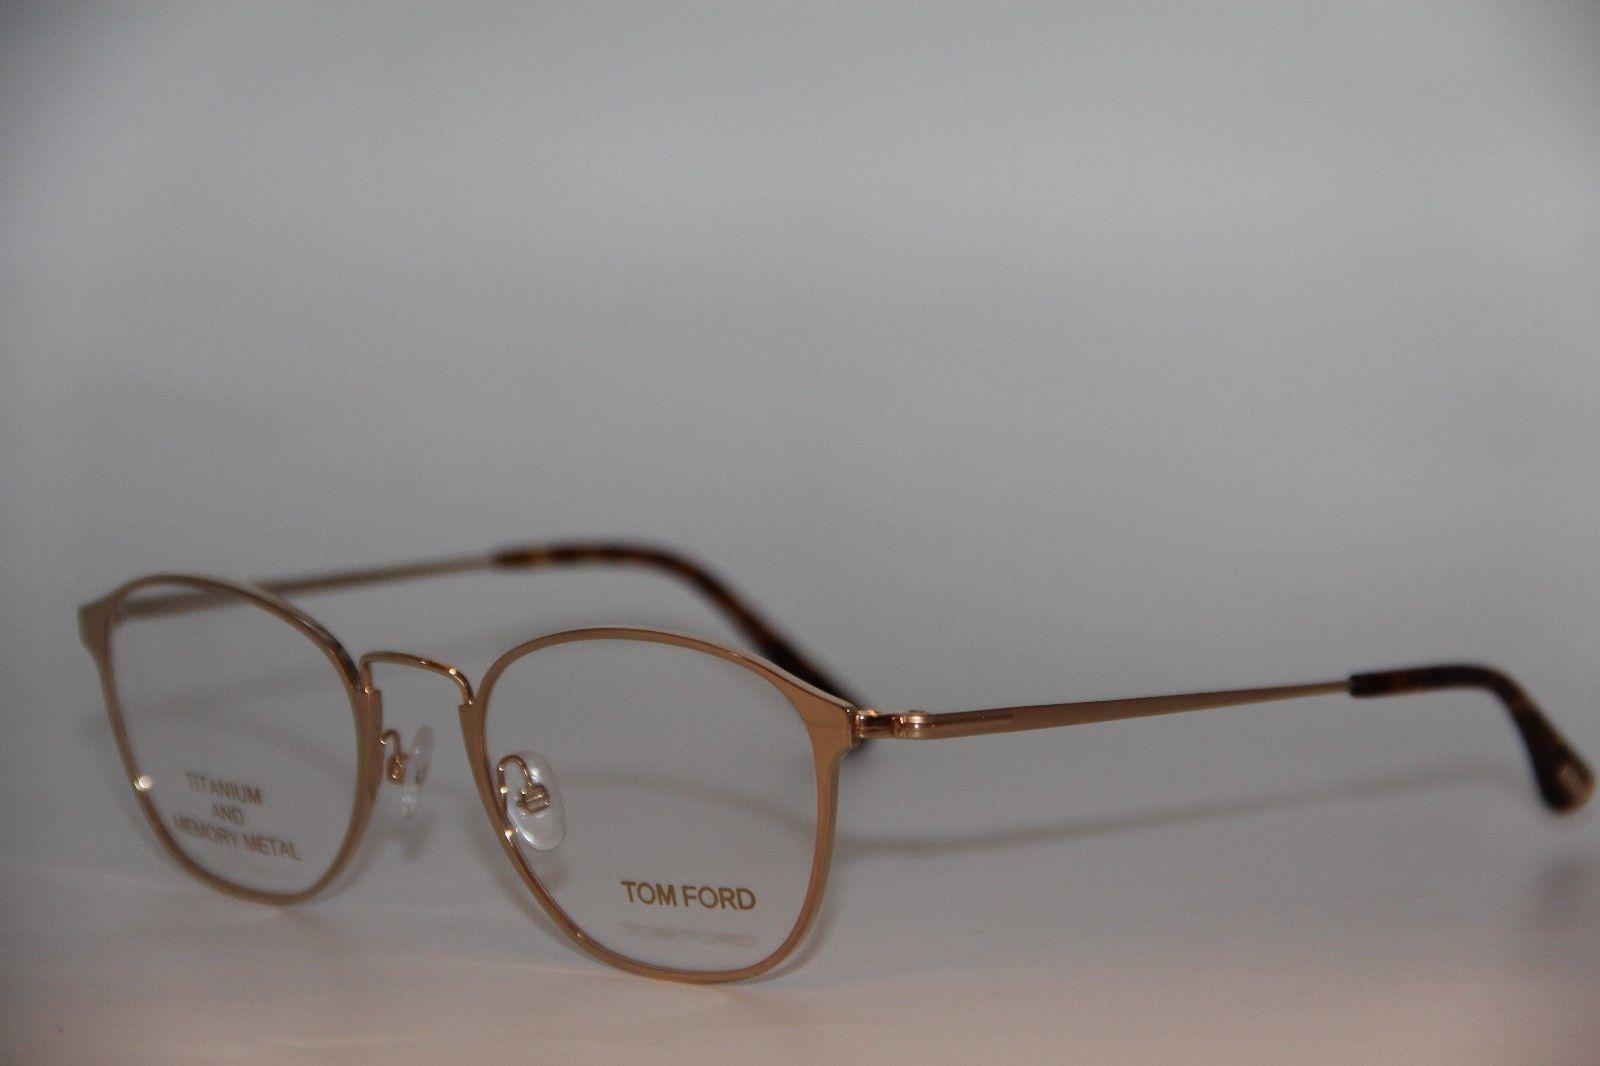 5e0c9b7ec2ae New Tom Ford Ft 5349 028 Gold Eyeglasses and 50 similar items. 57